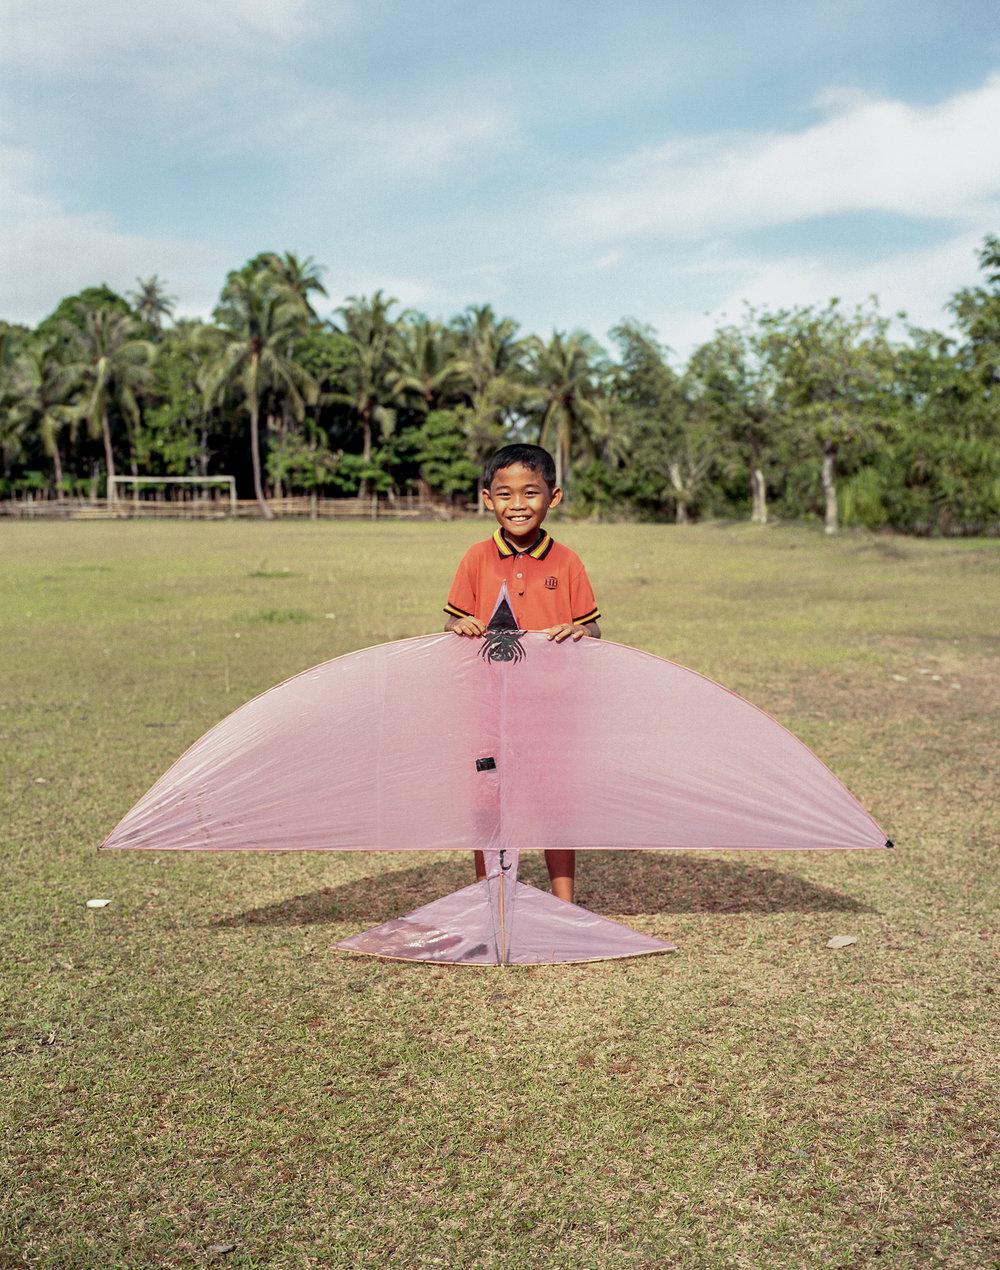 indo.kites253.jpg